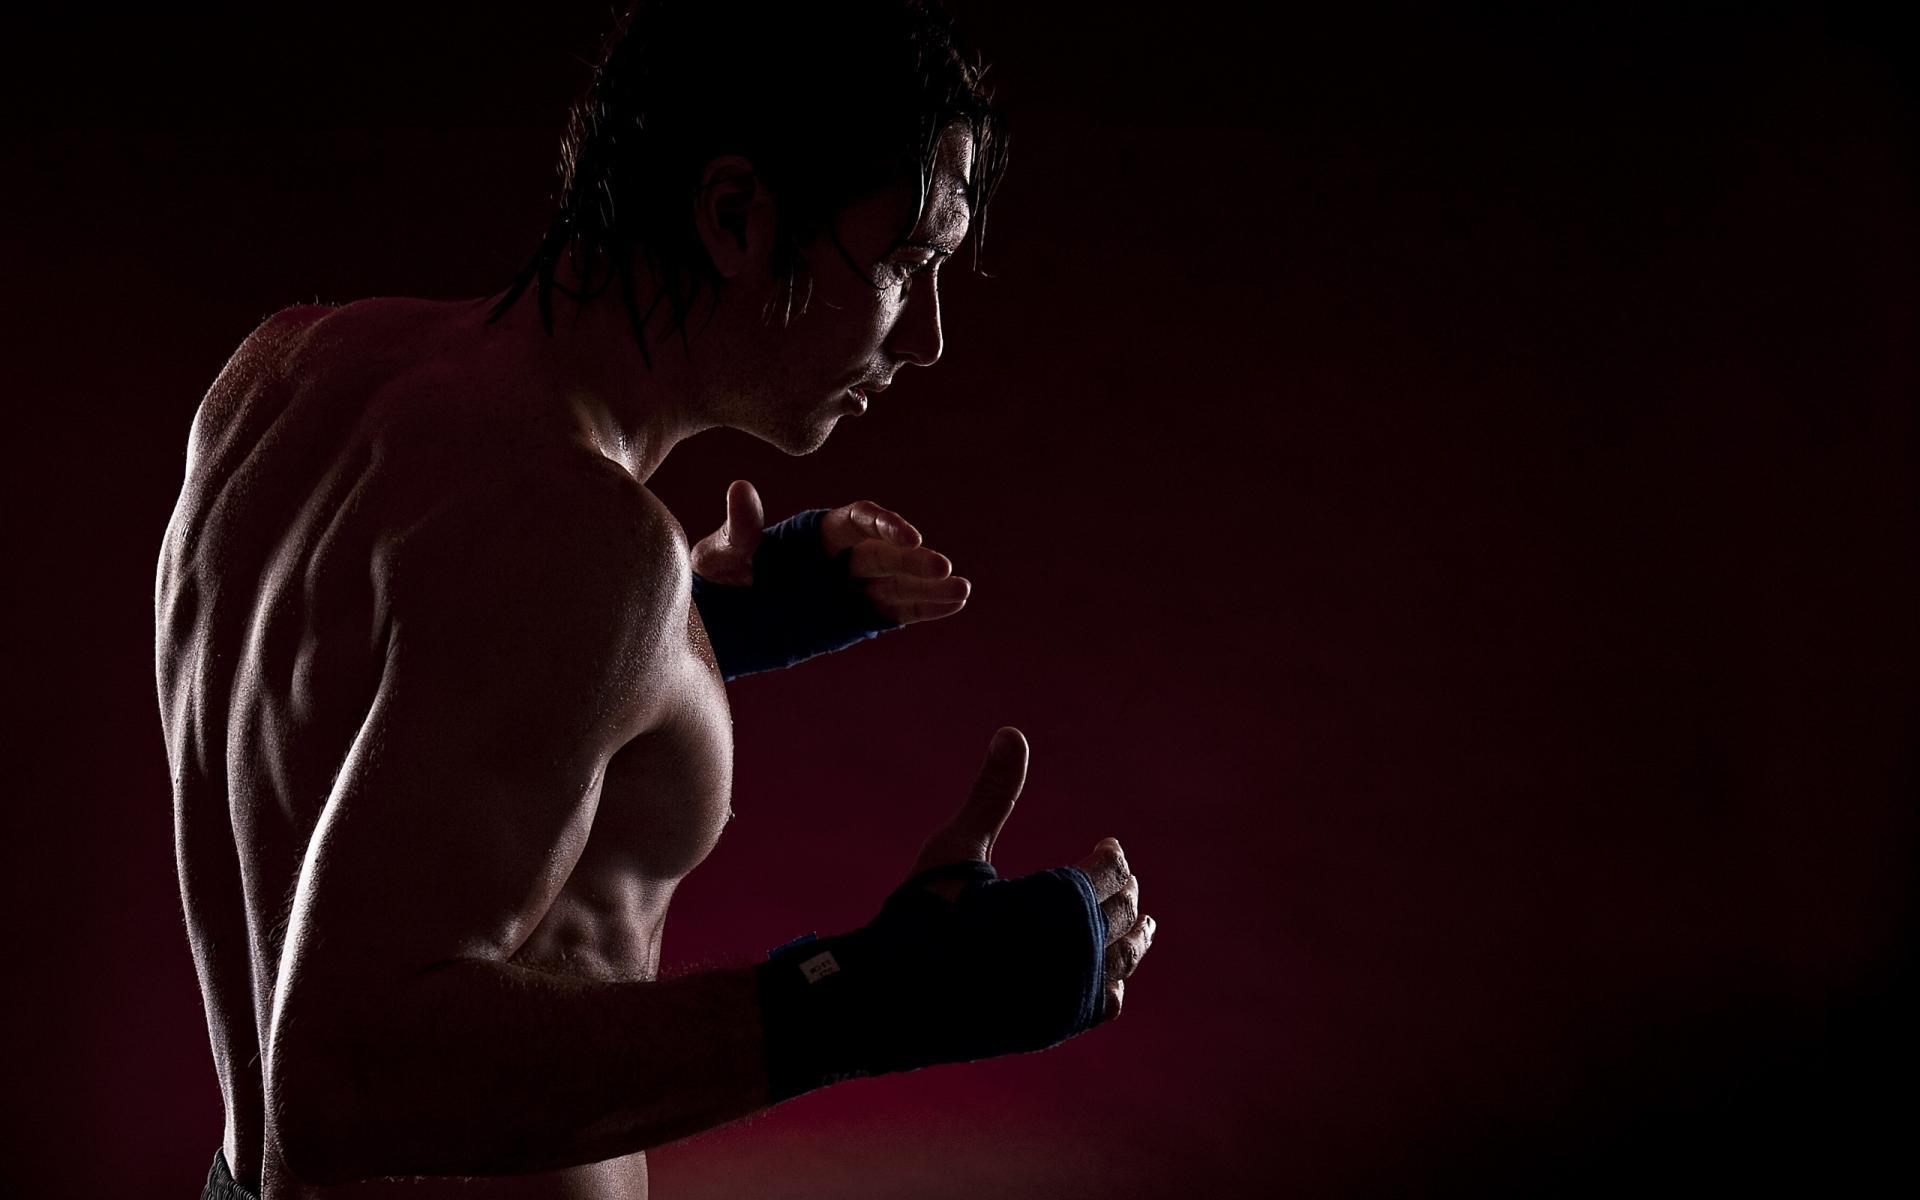 boxing fitness men wallpaper 1920x1200 29335 wallpaperup